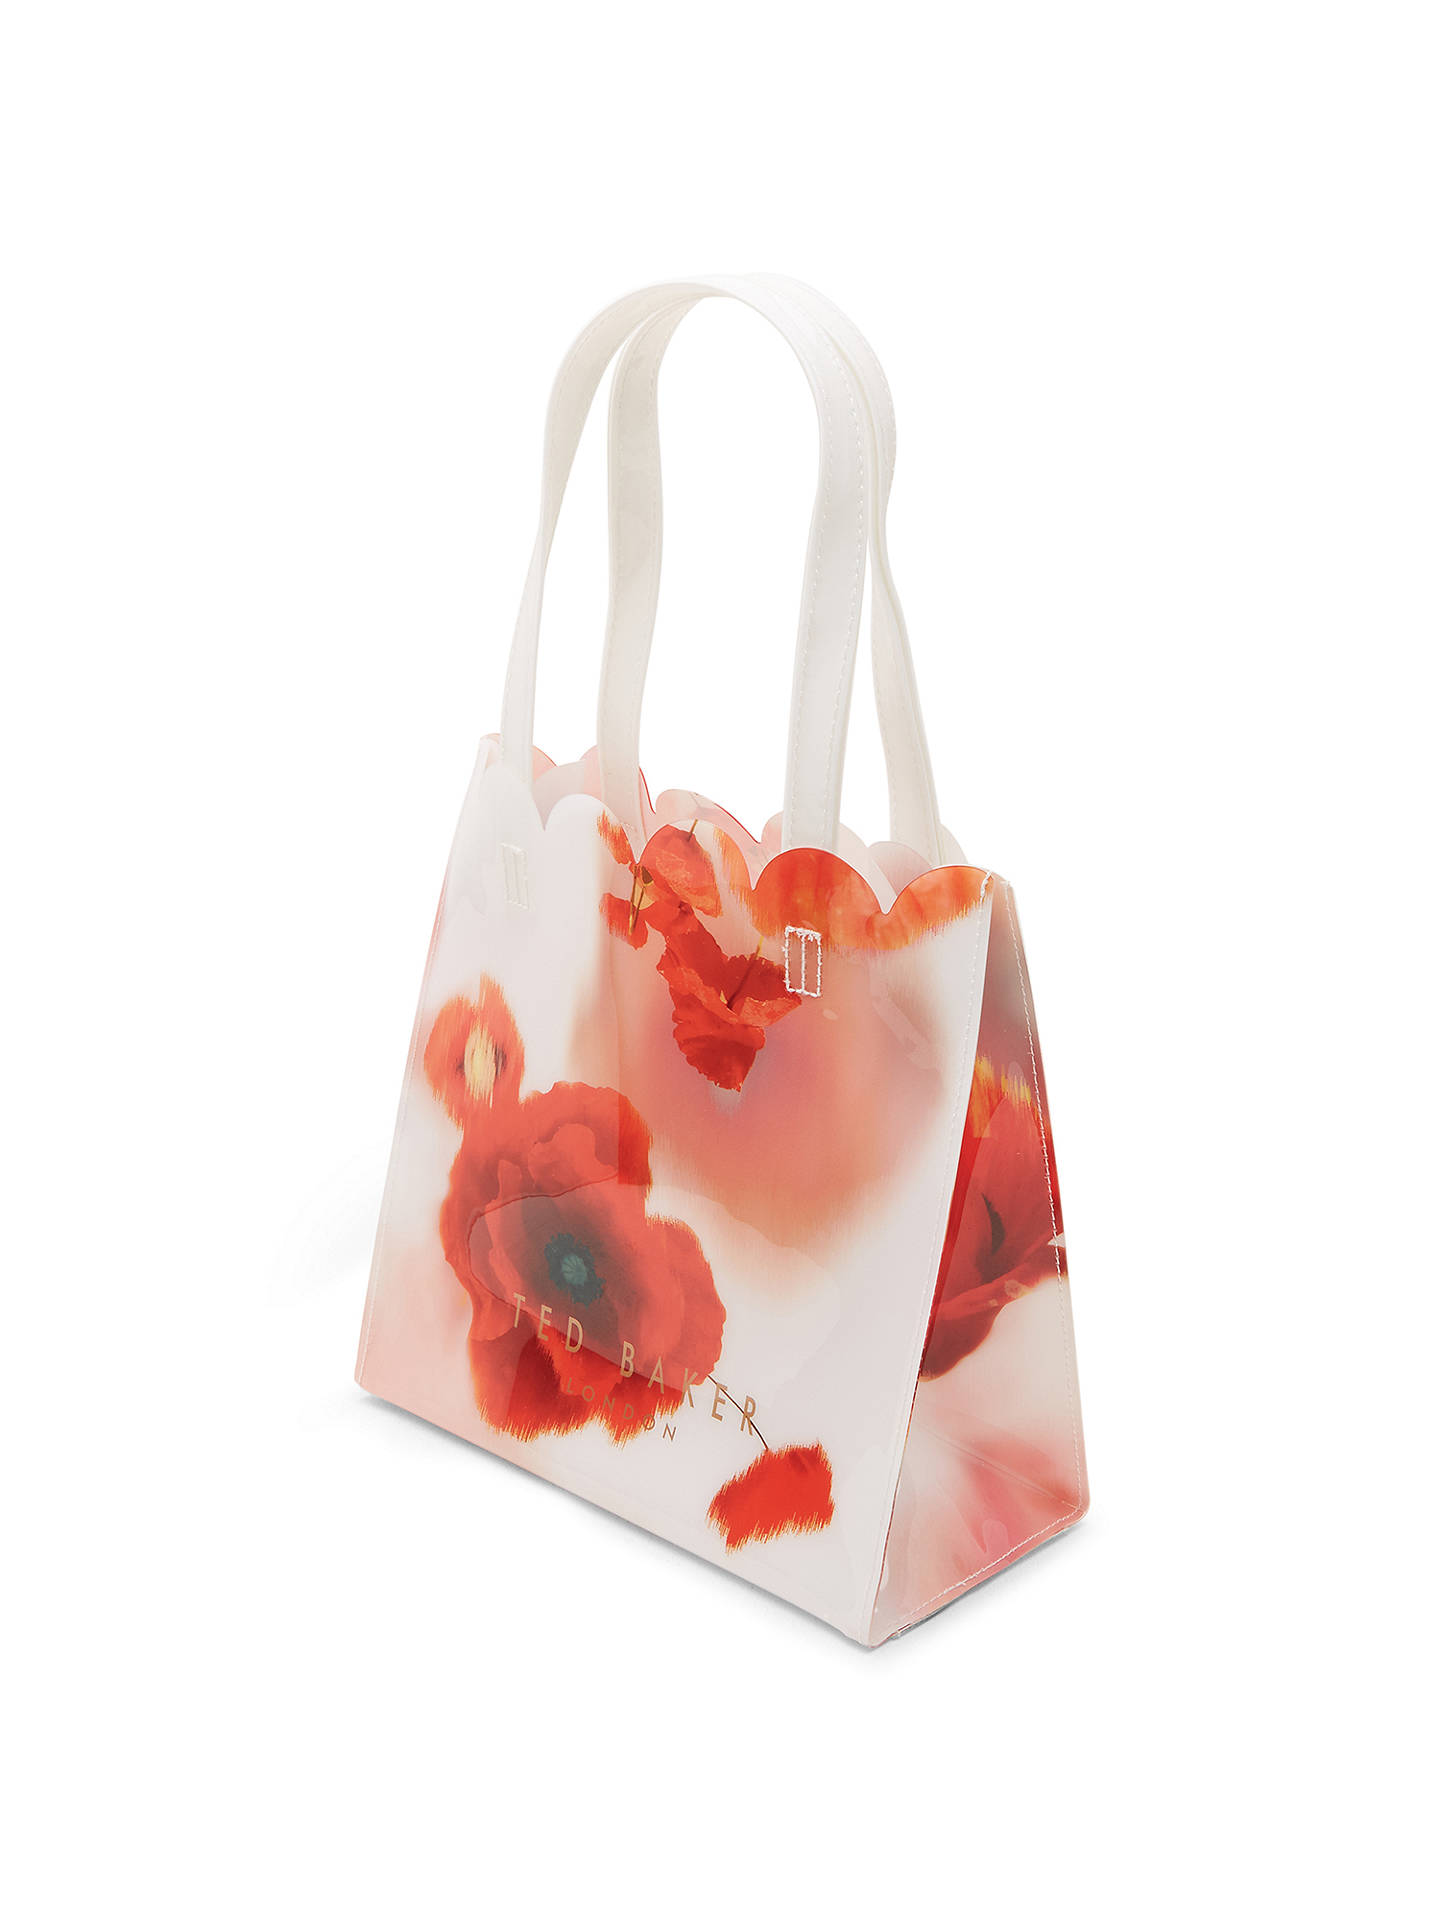 Red Playful Poppy Johnlewis Icon Comprado Mid Icon Bag Baker Online en Melacon xqpEWnZwg8